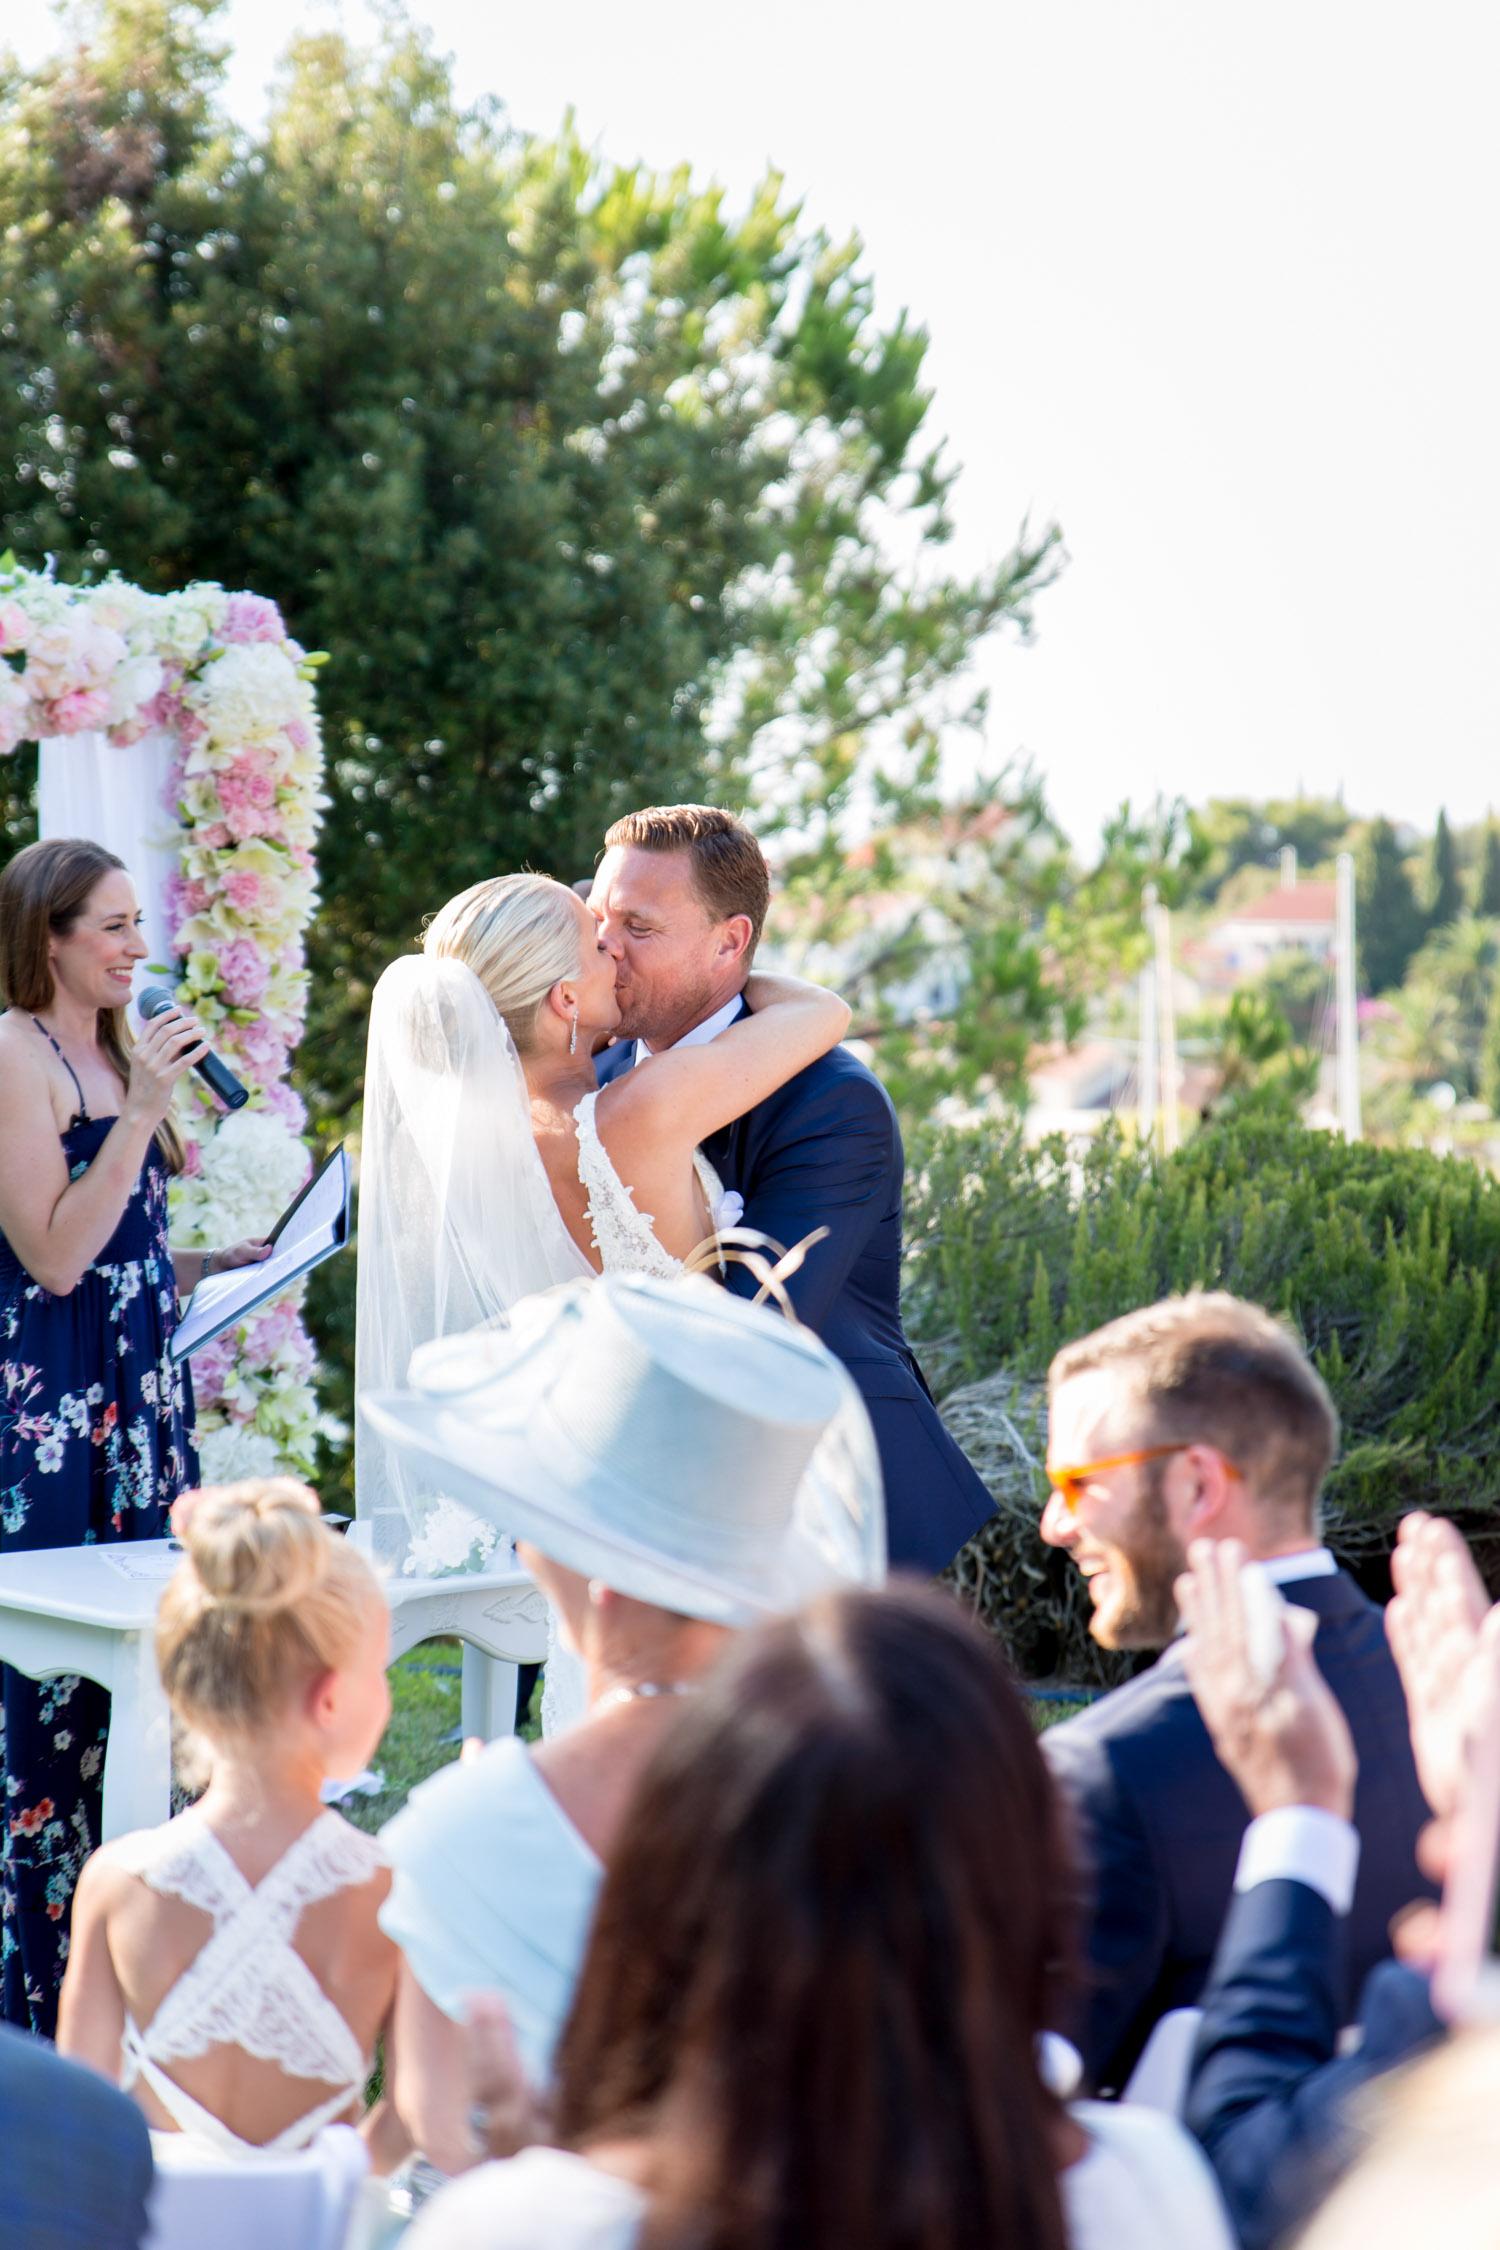 Katy&Dan-Wedding-34.jpg